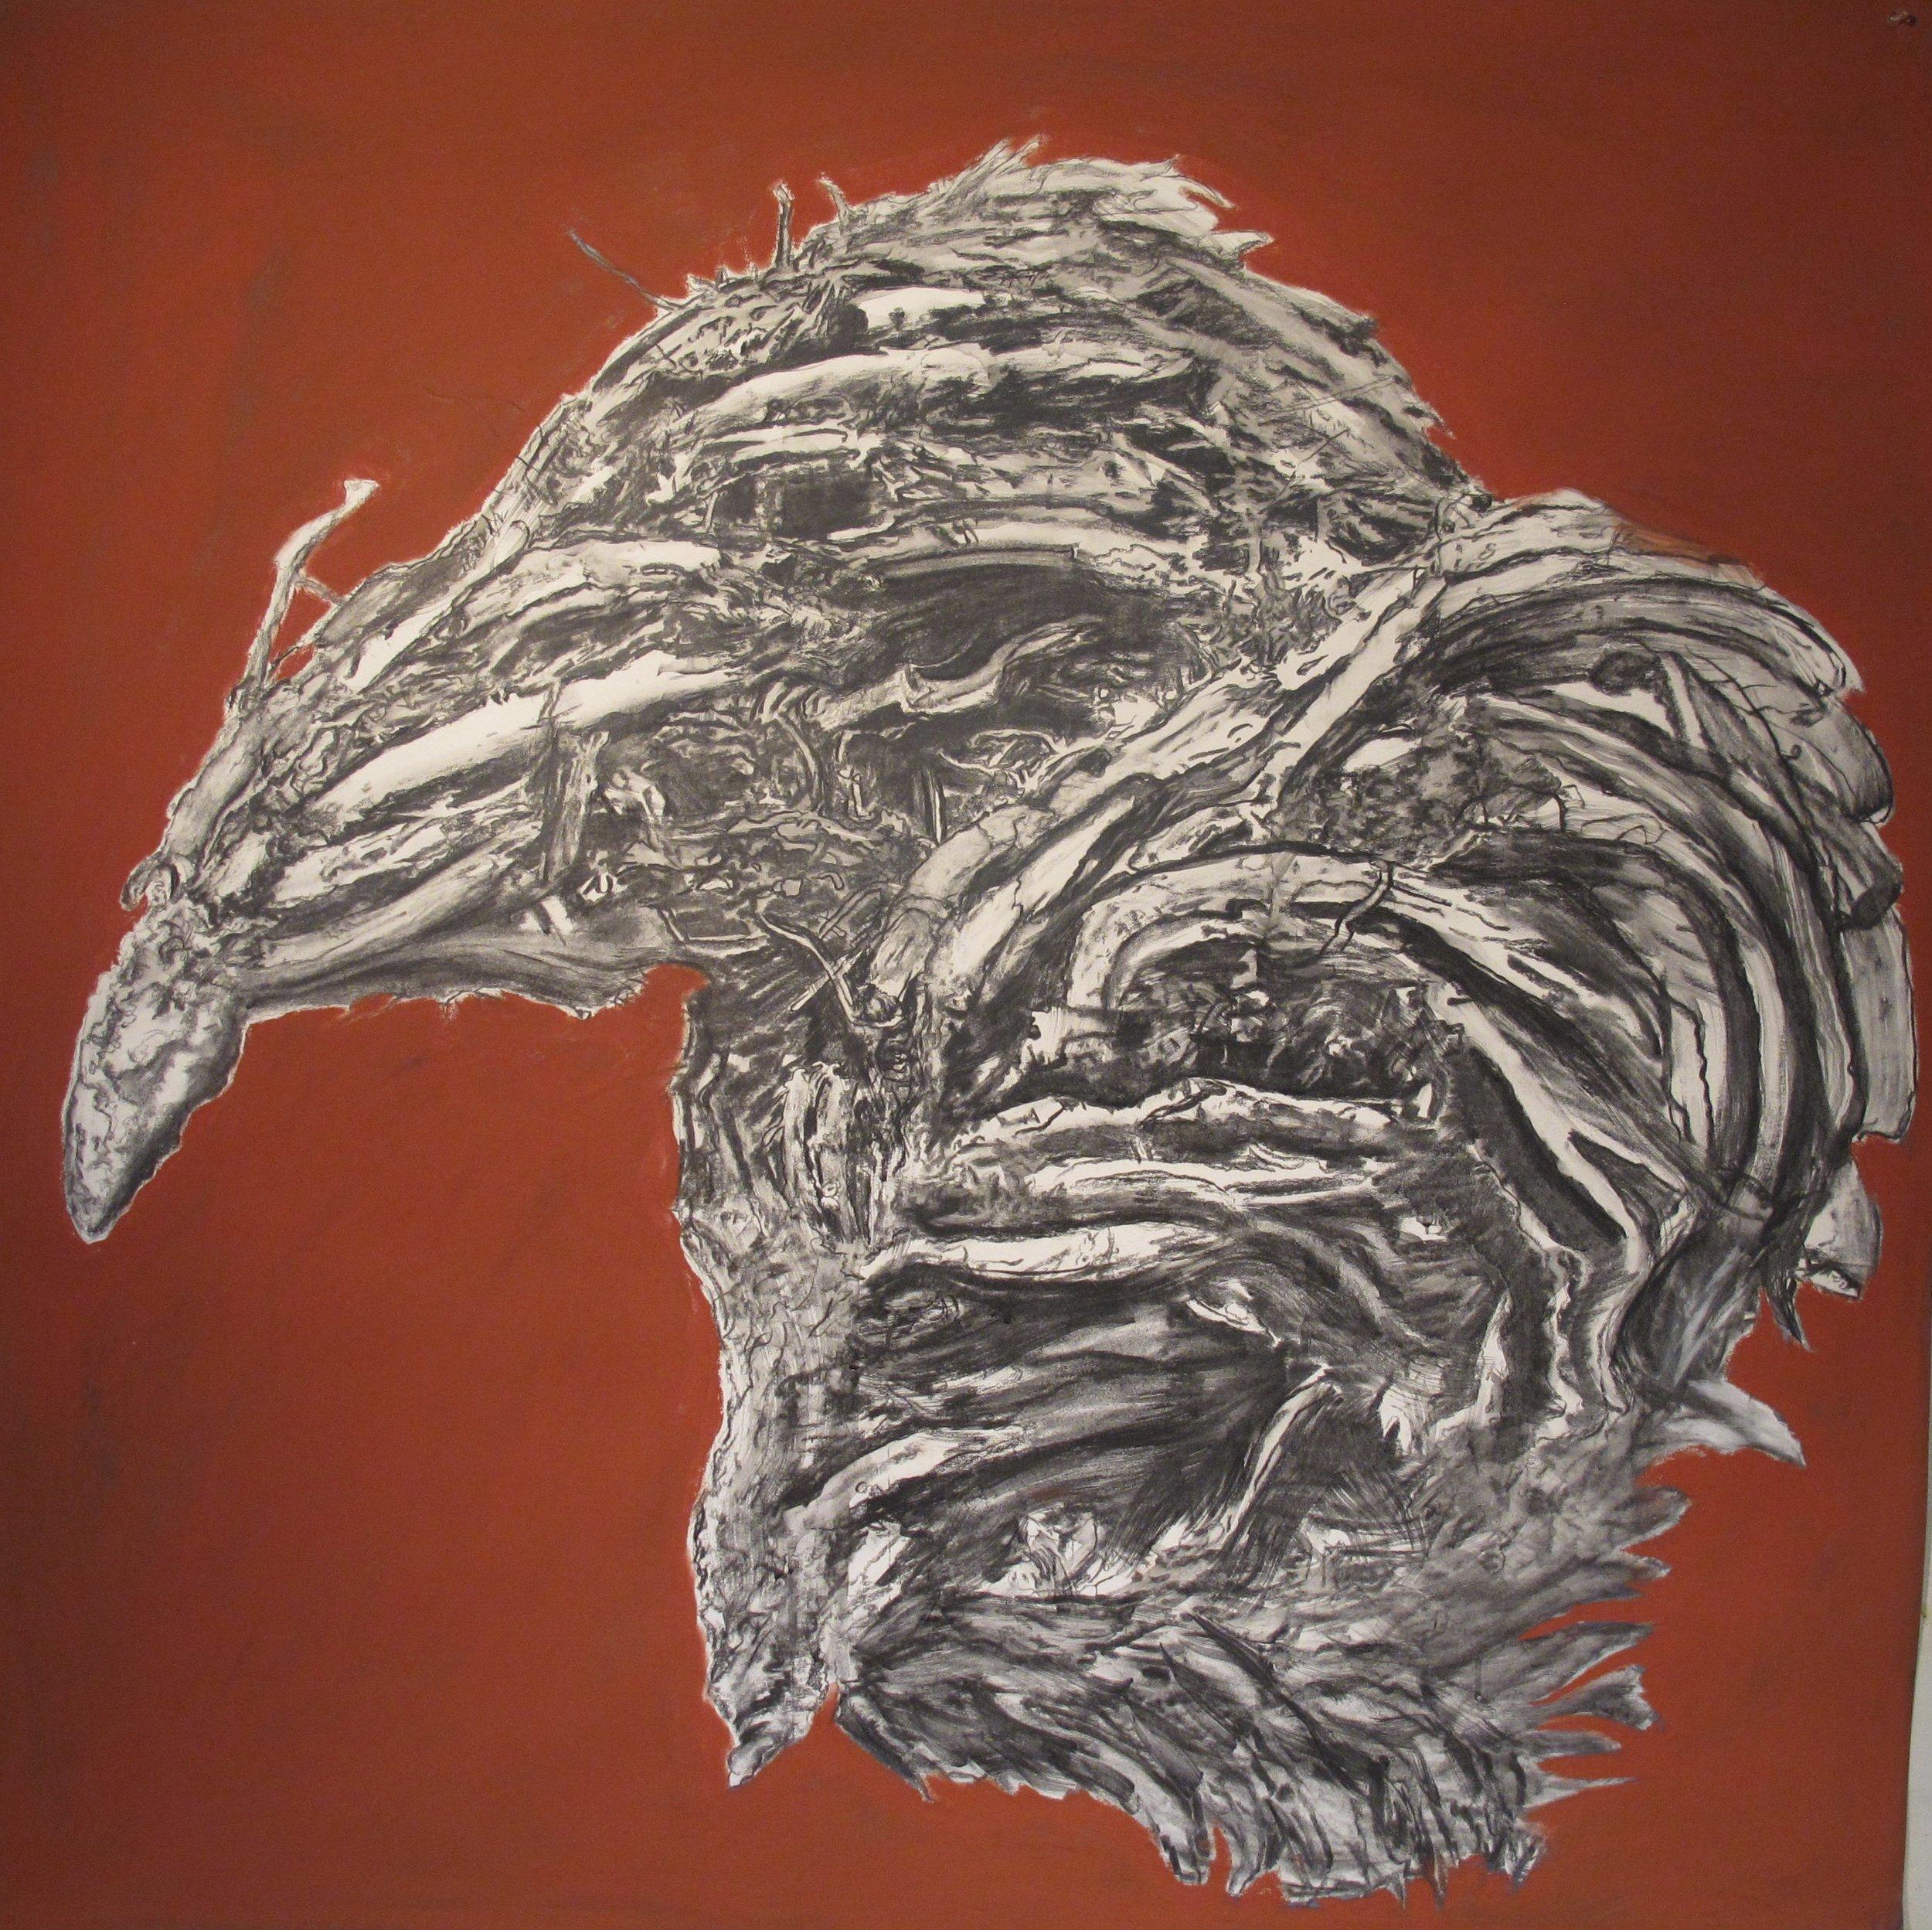 Raven Bundle with Rust